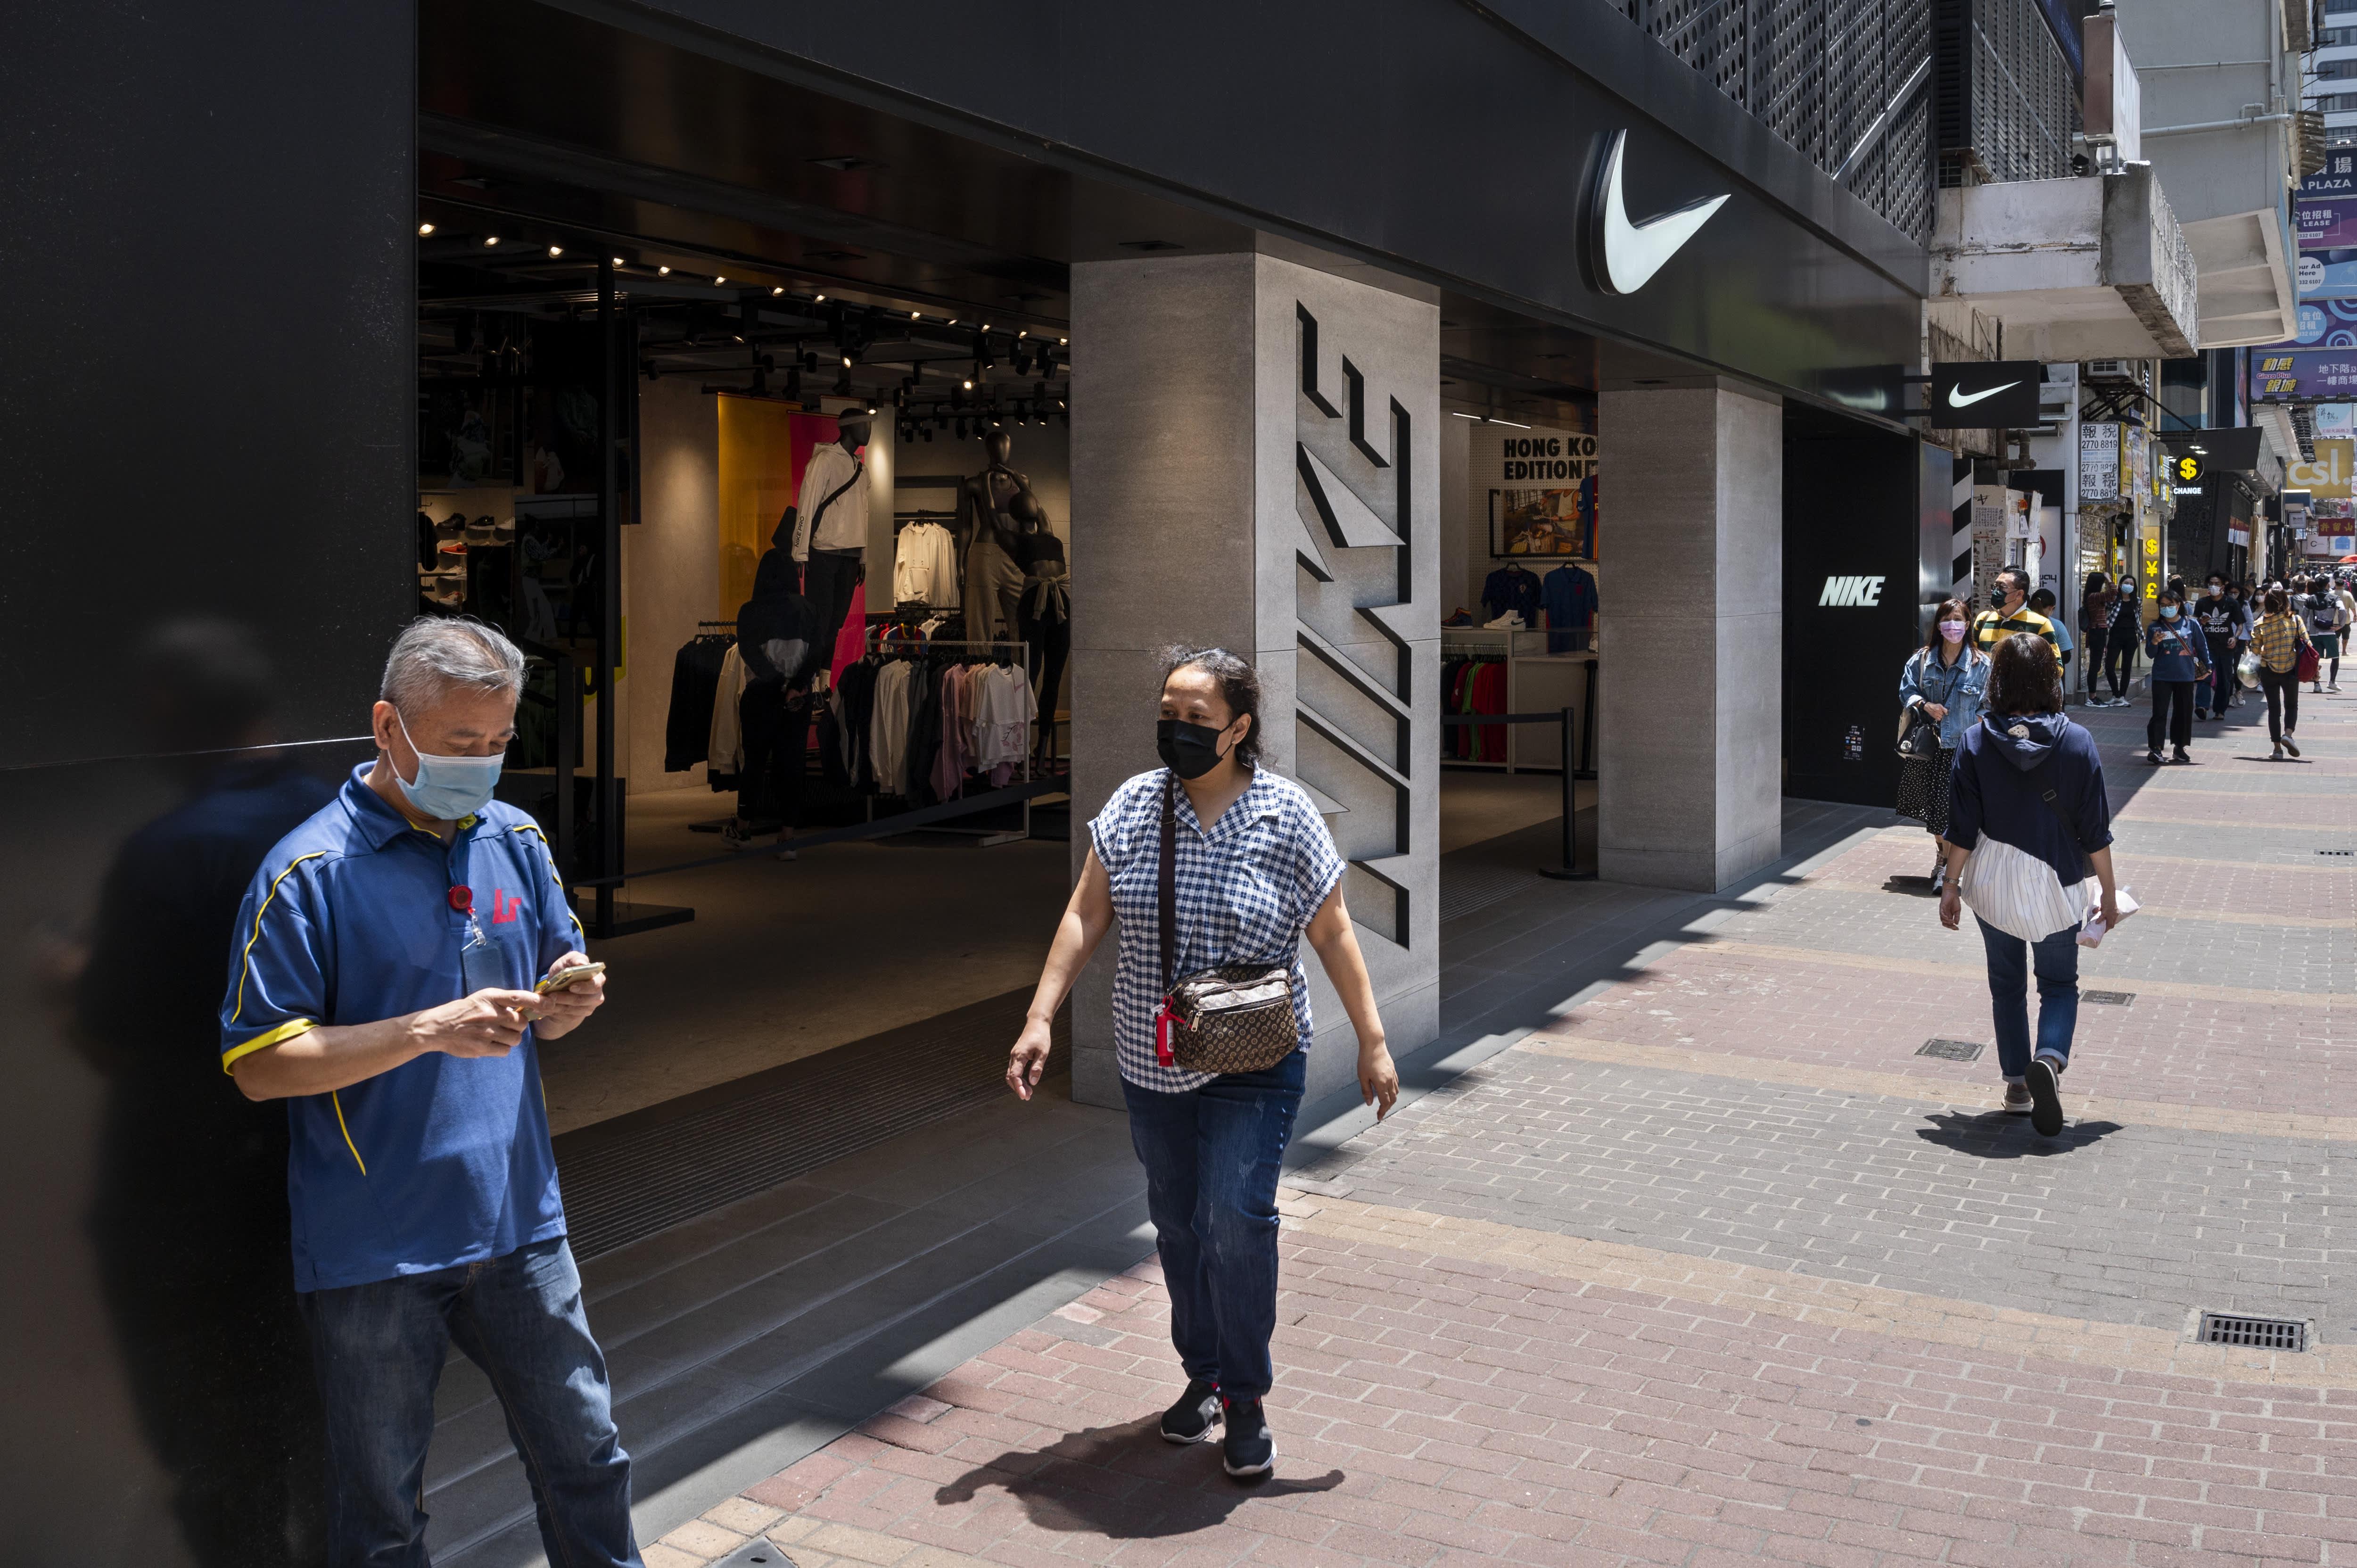 Nike shares fall as supply chain havoc leads retailer to slash revenue forecast